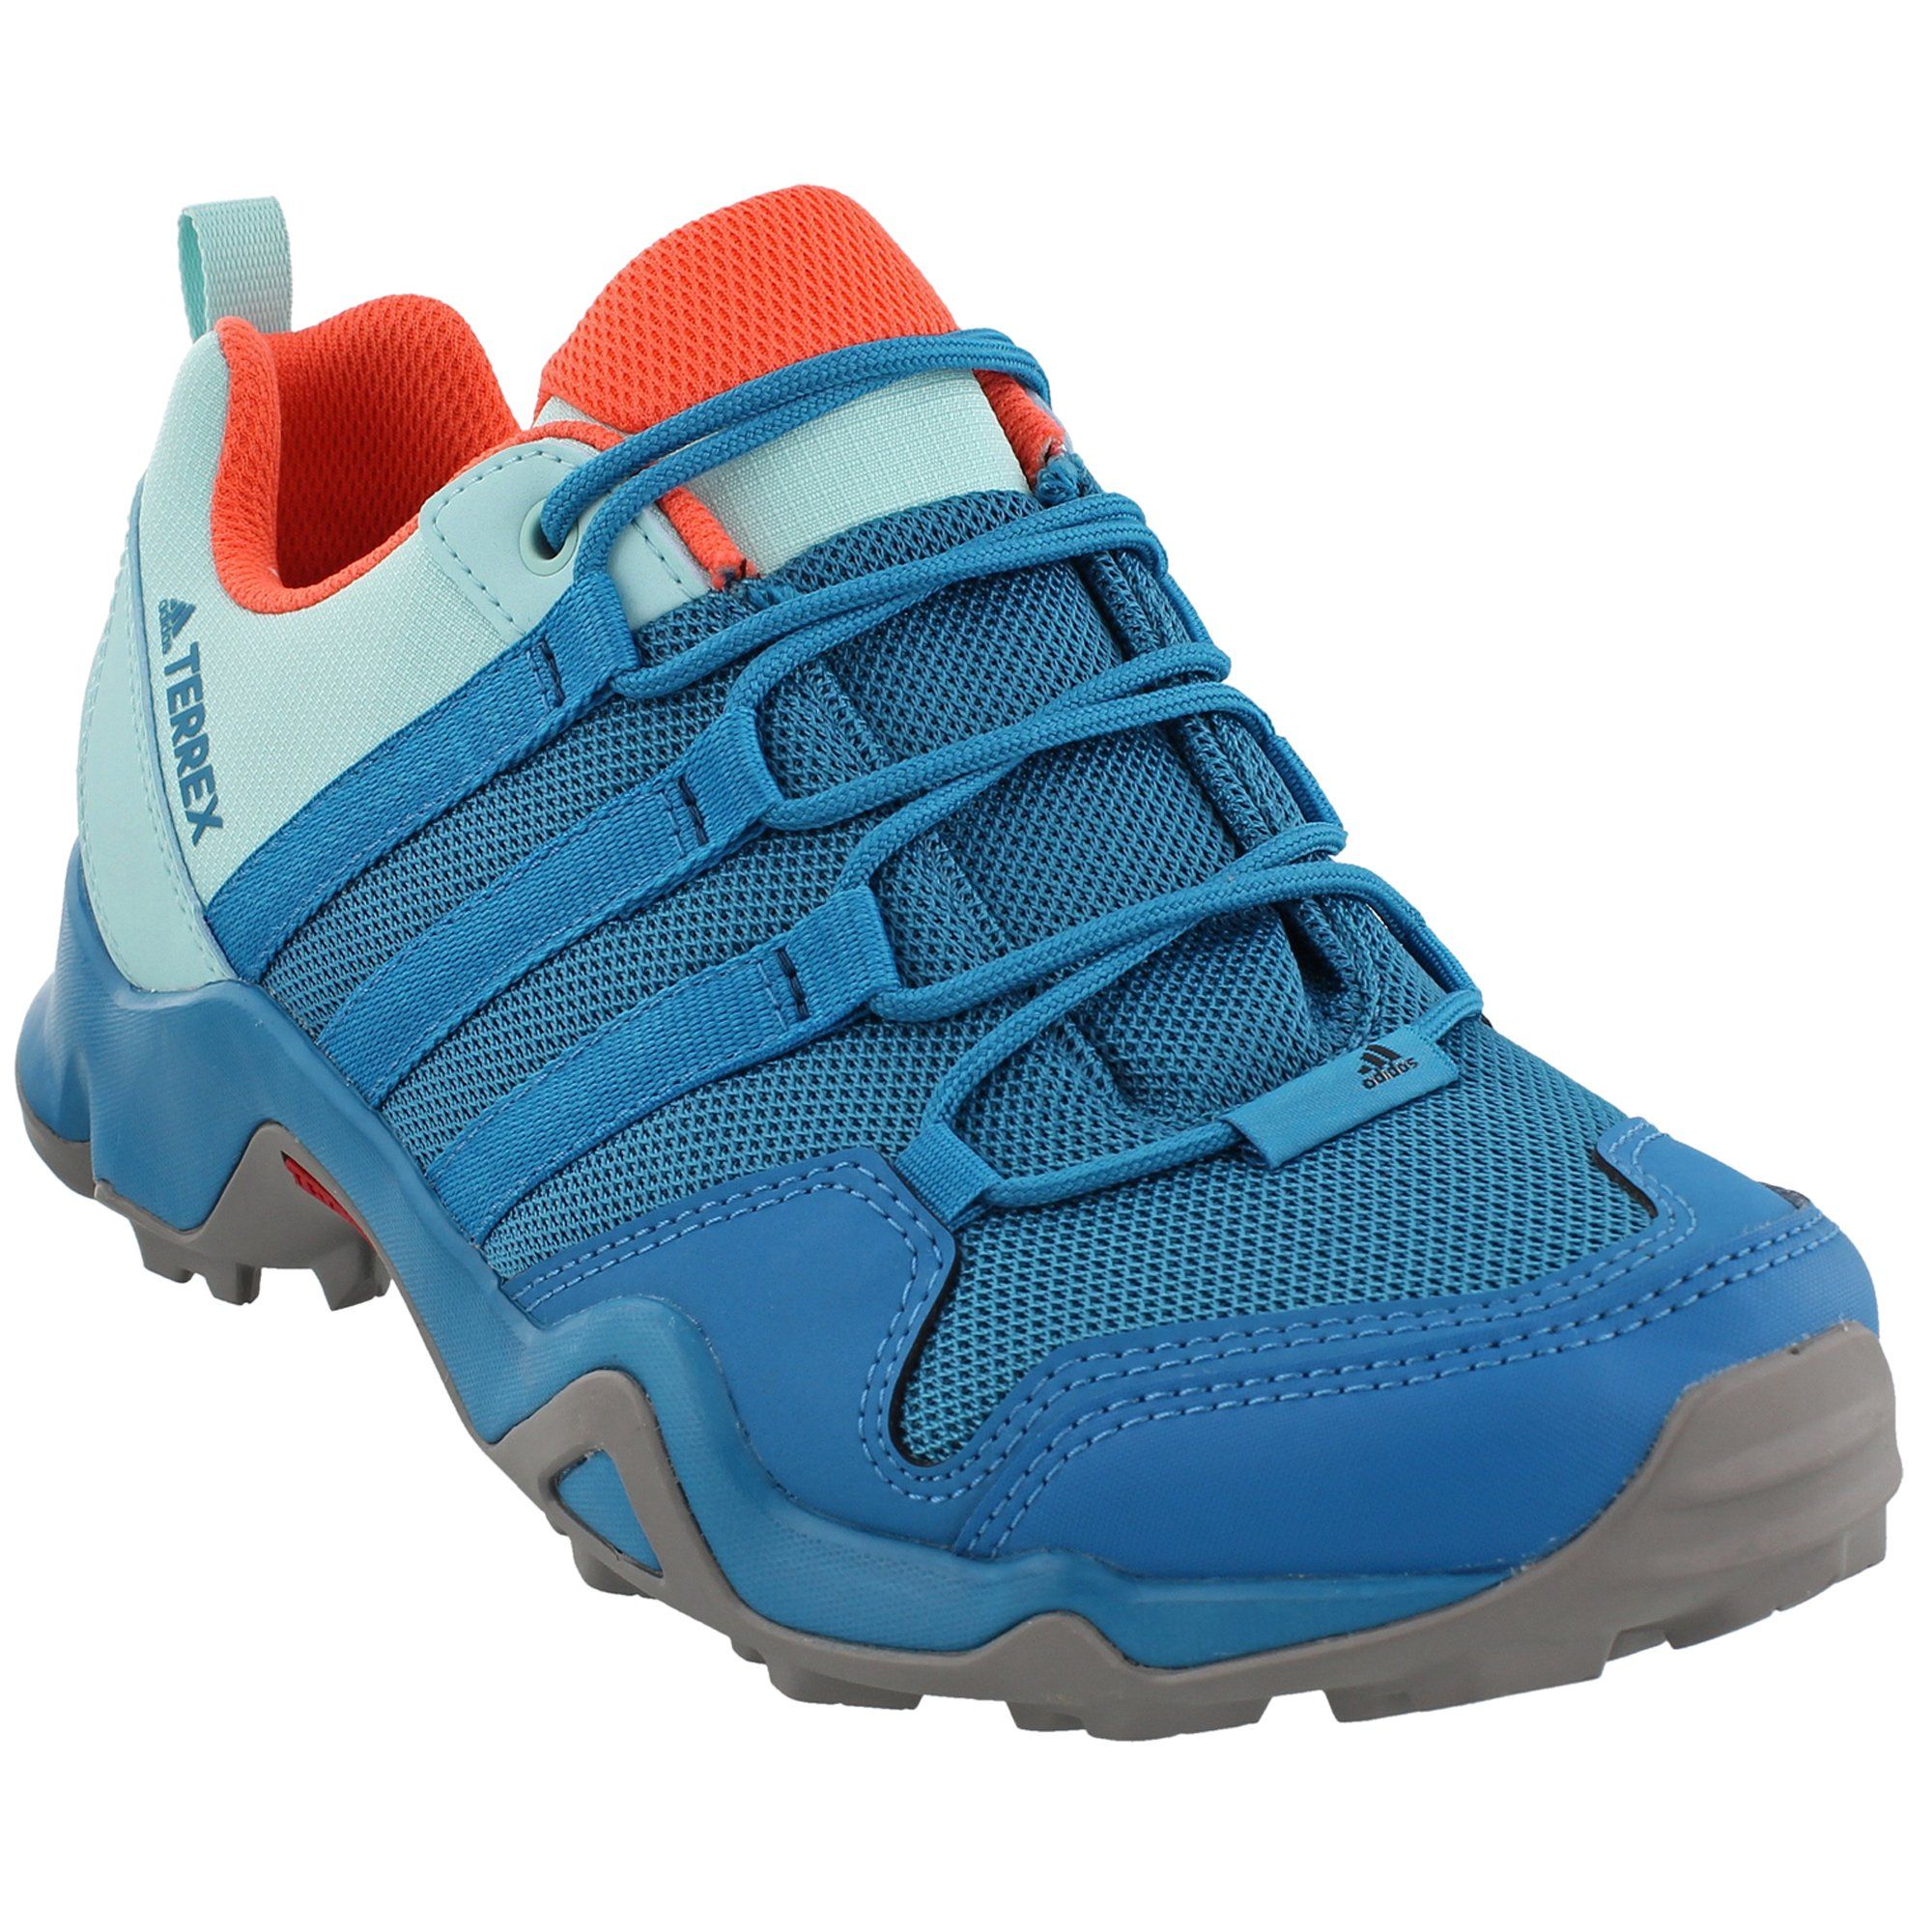 adidas outdoor Women's Terrex AX2R Mystery Petrol/Mystery Petrol/Easy Coral 9 B US